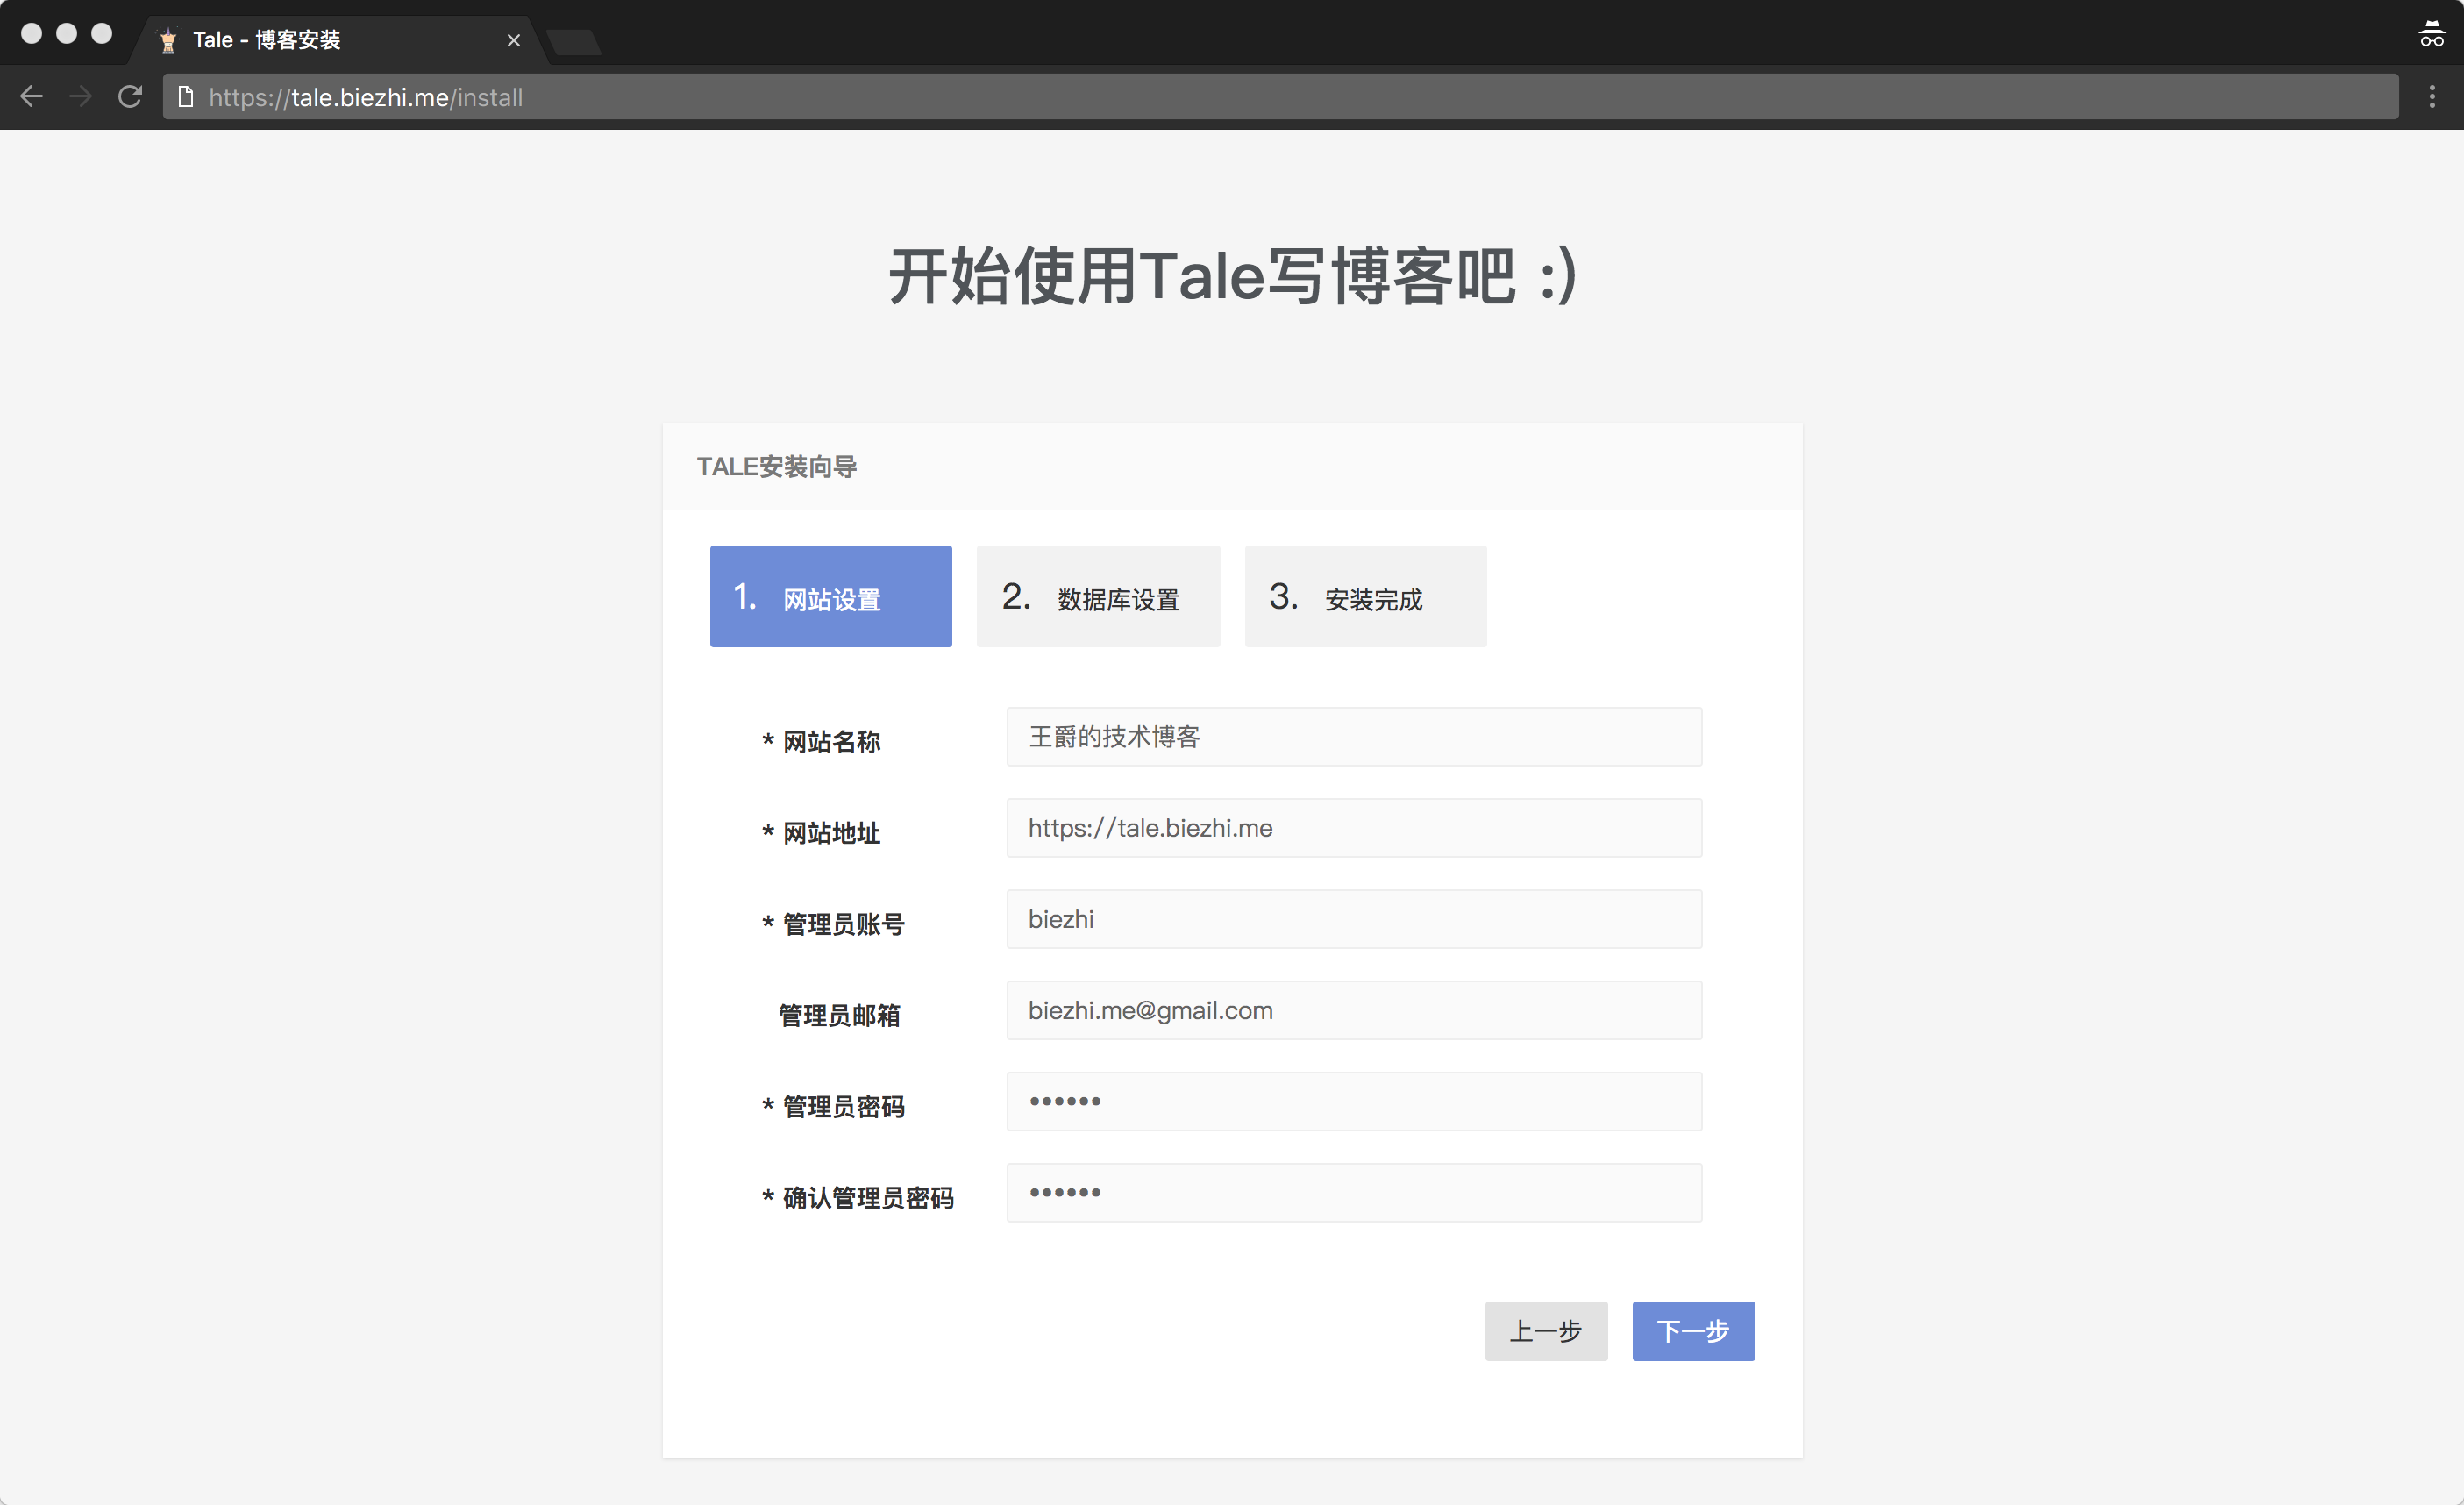 Java 博客系统 Tale